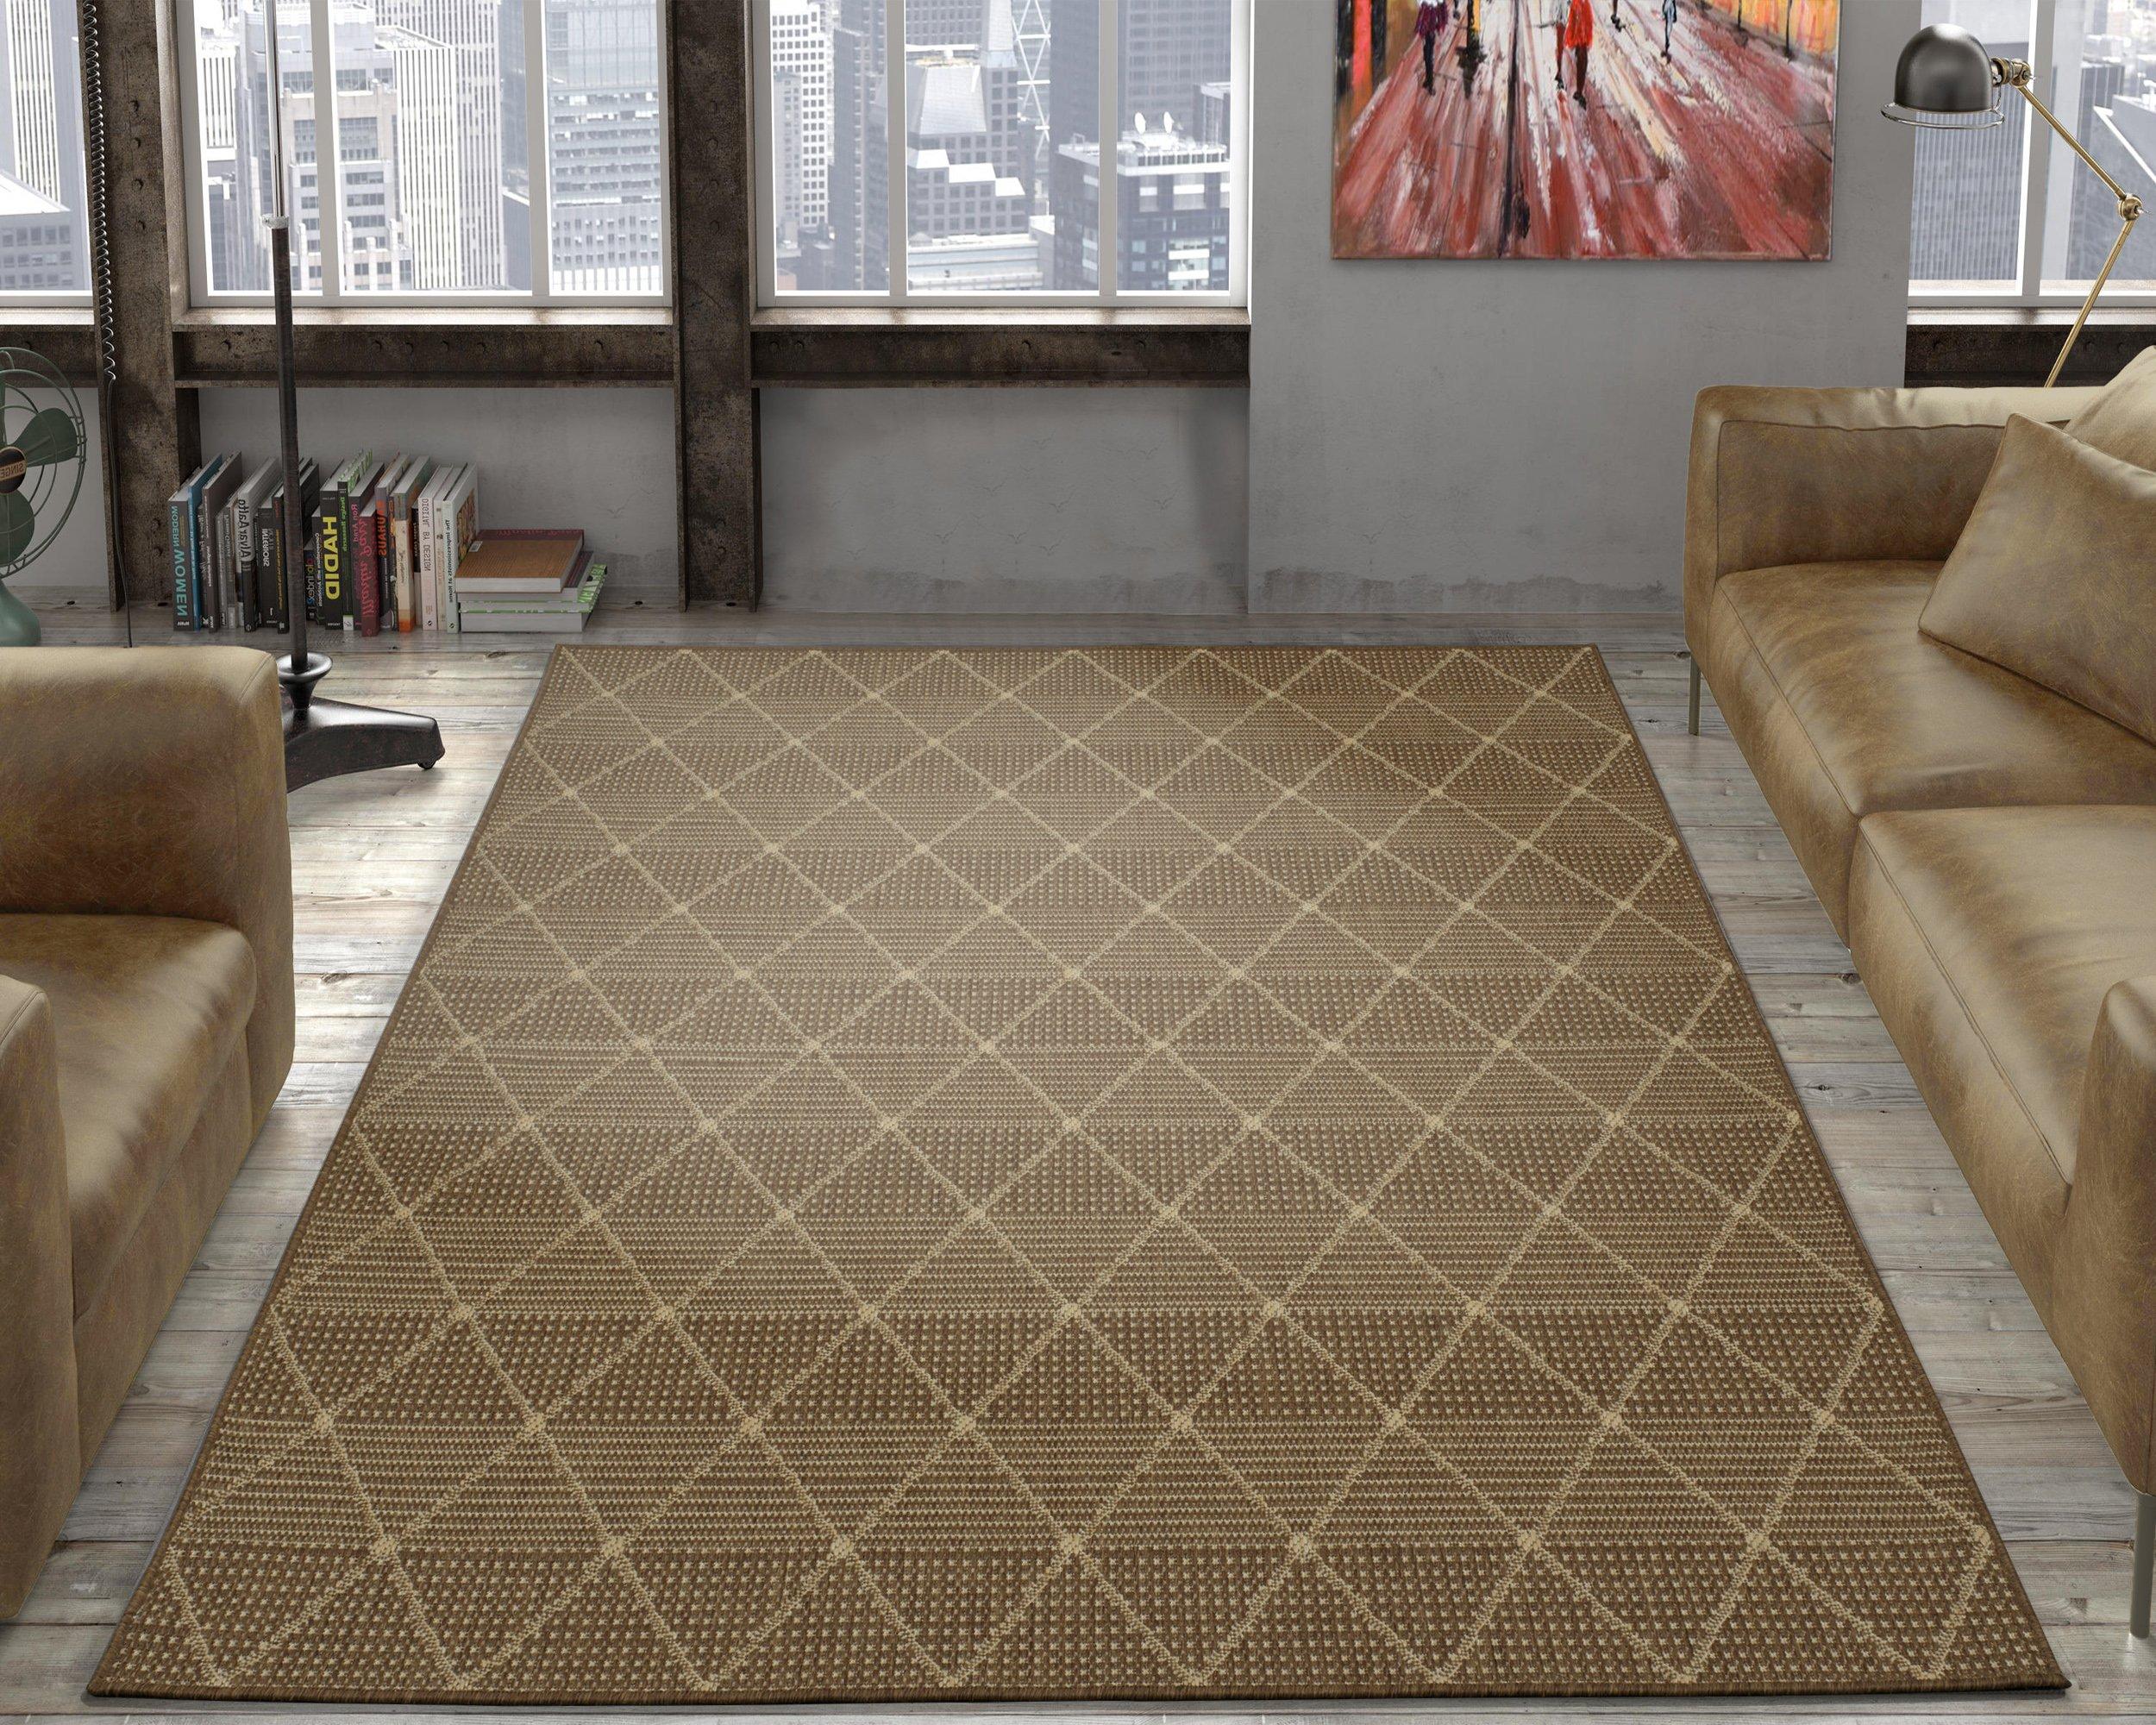 Ottomanson jardin collection contemporary trellis design indoor outdoor jute backing area synthetic sisal rug